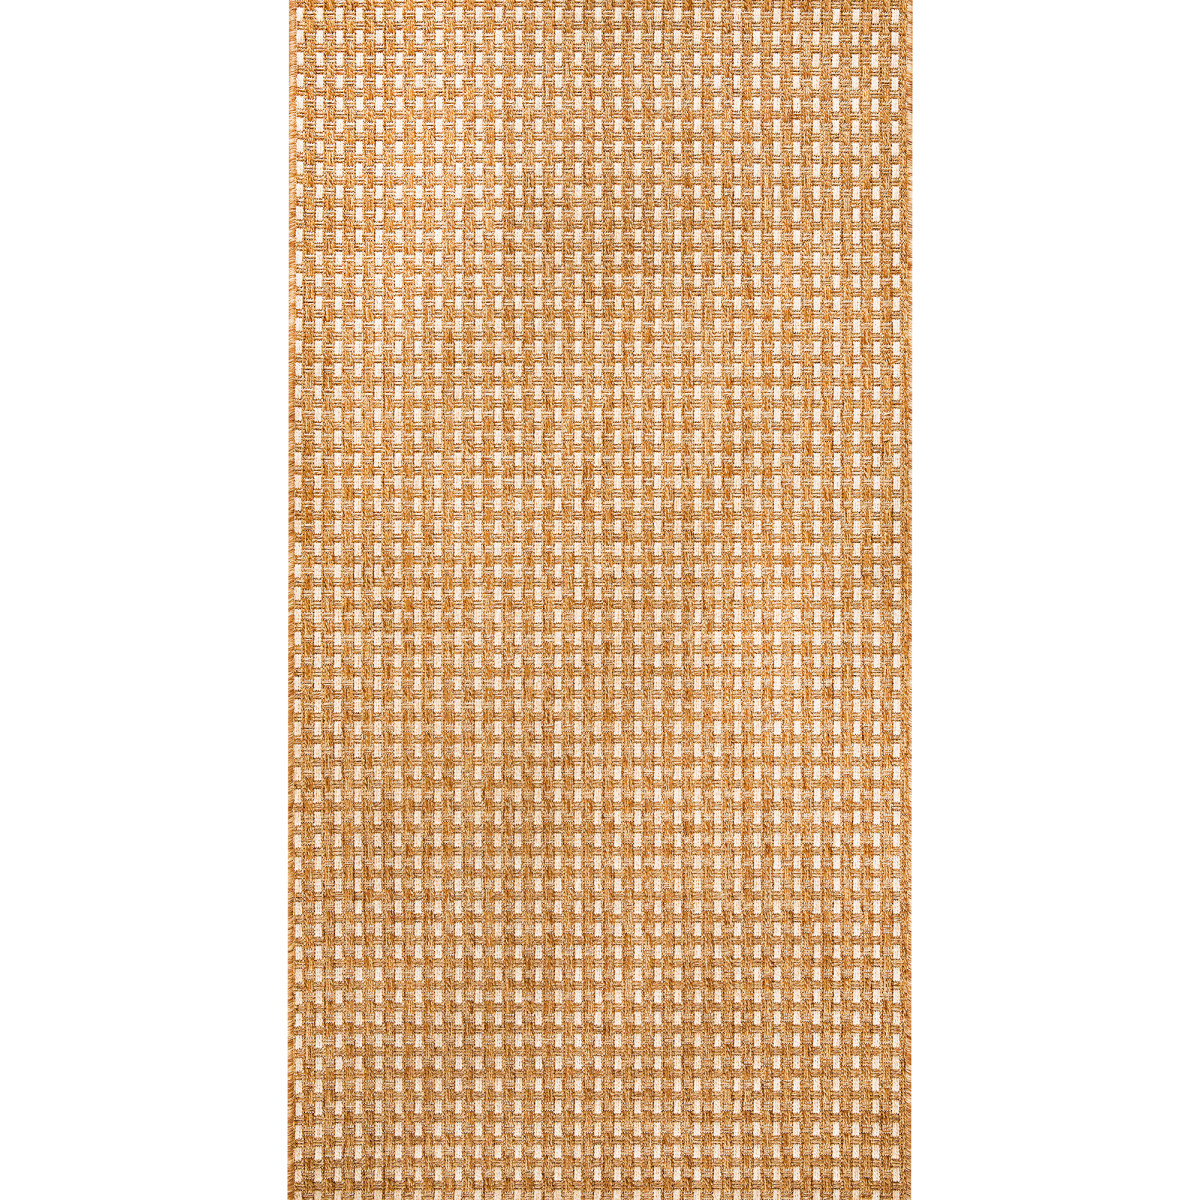 Ковёр Grace 39003/275 0.8x1.5 м полипропилен